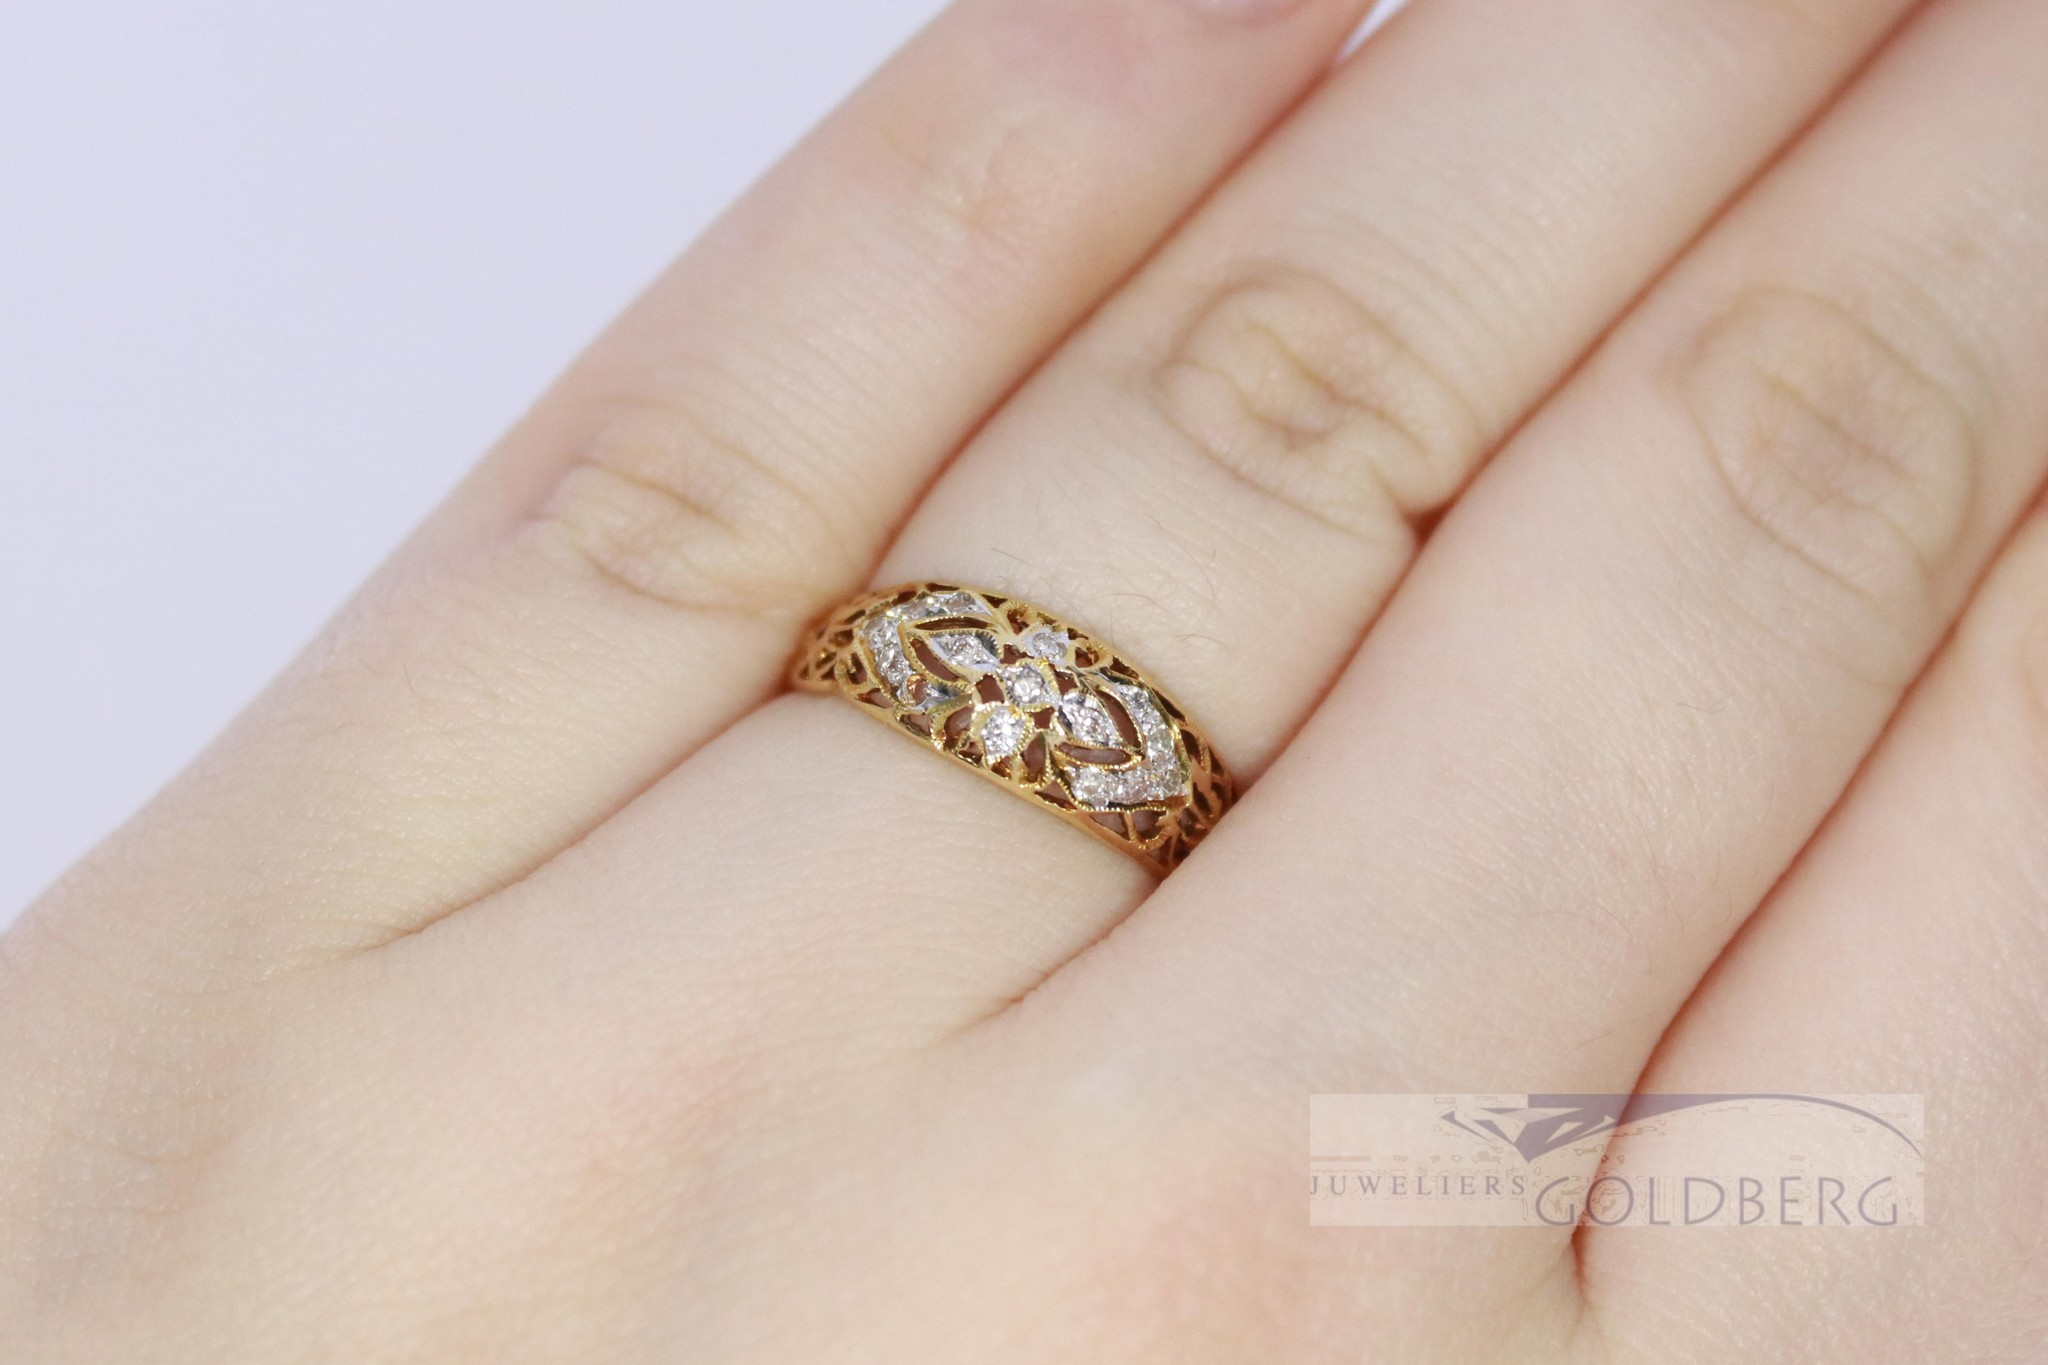 18k geelgouden opengewerkte fantasiering met diamant